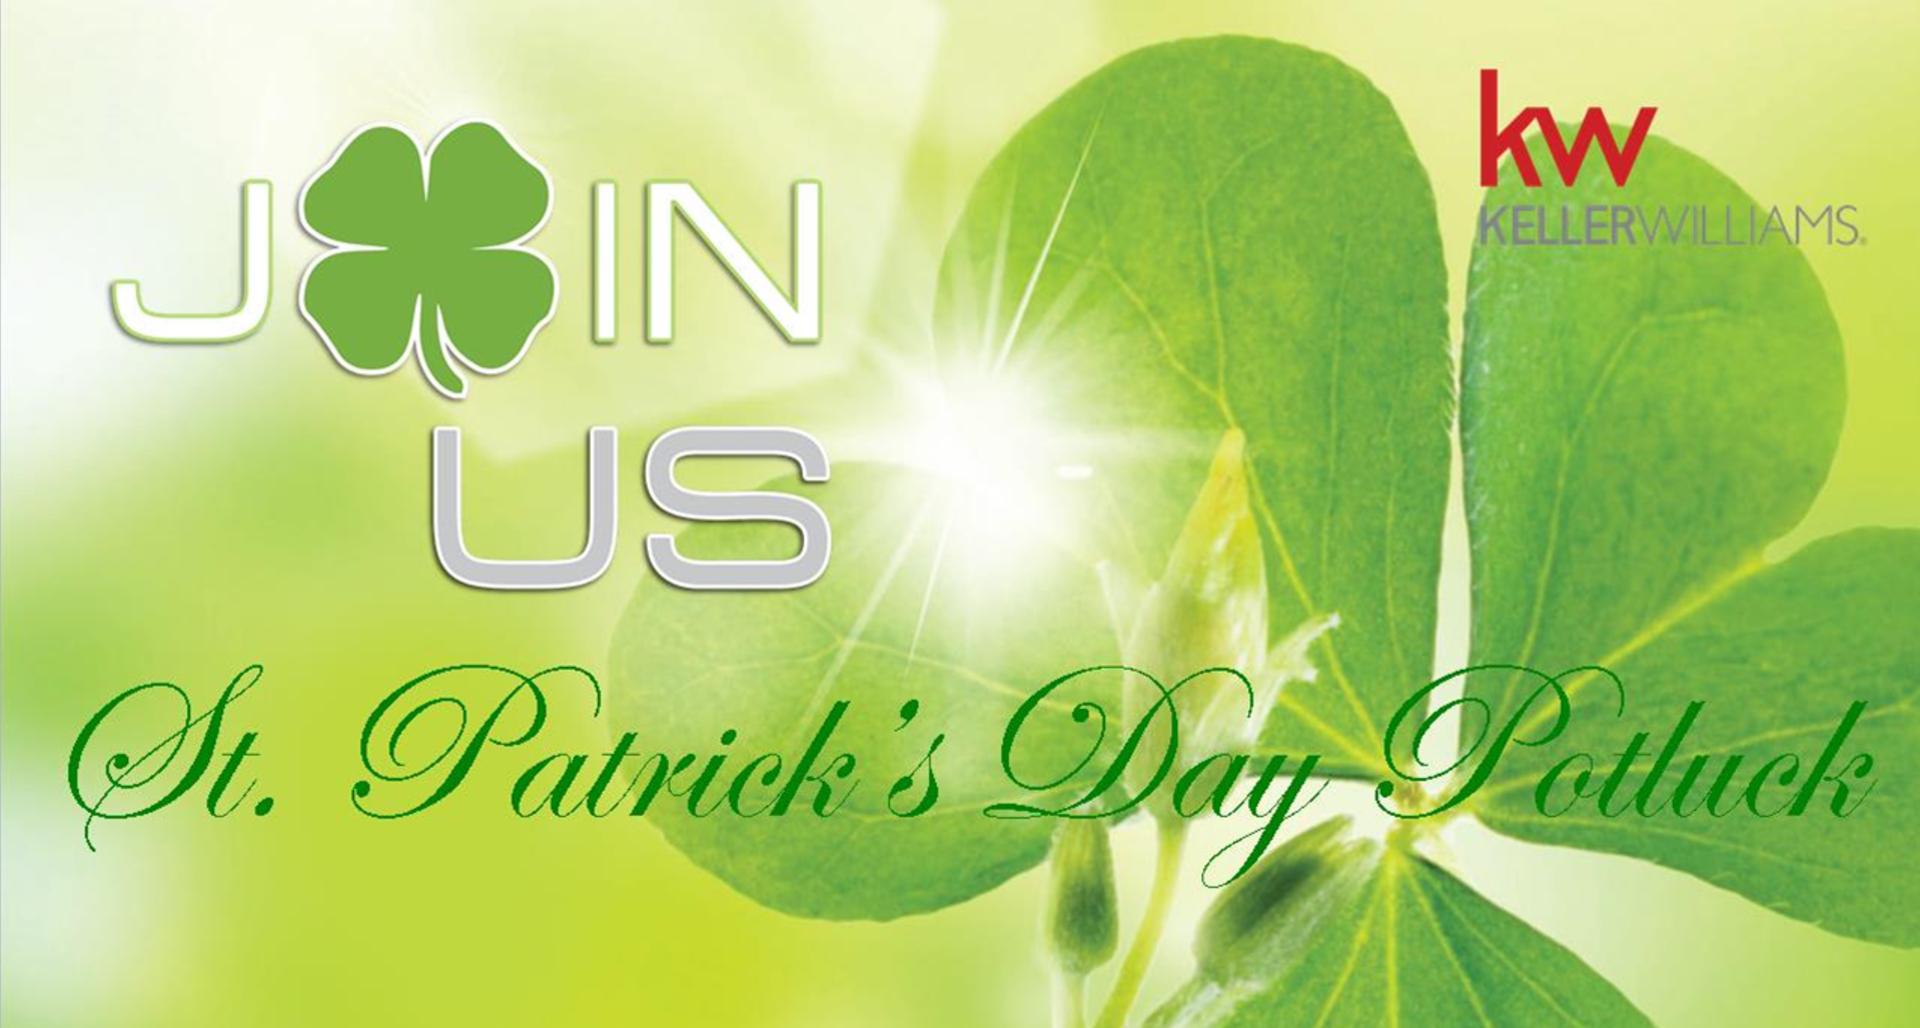 St. Patrick's Day Potluck Recap!